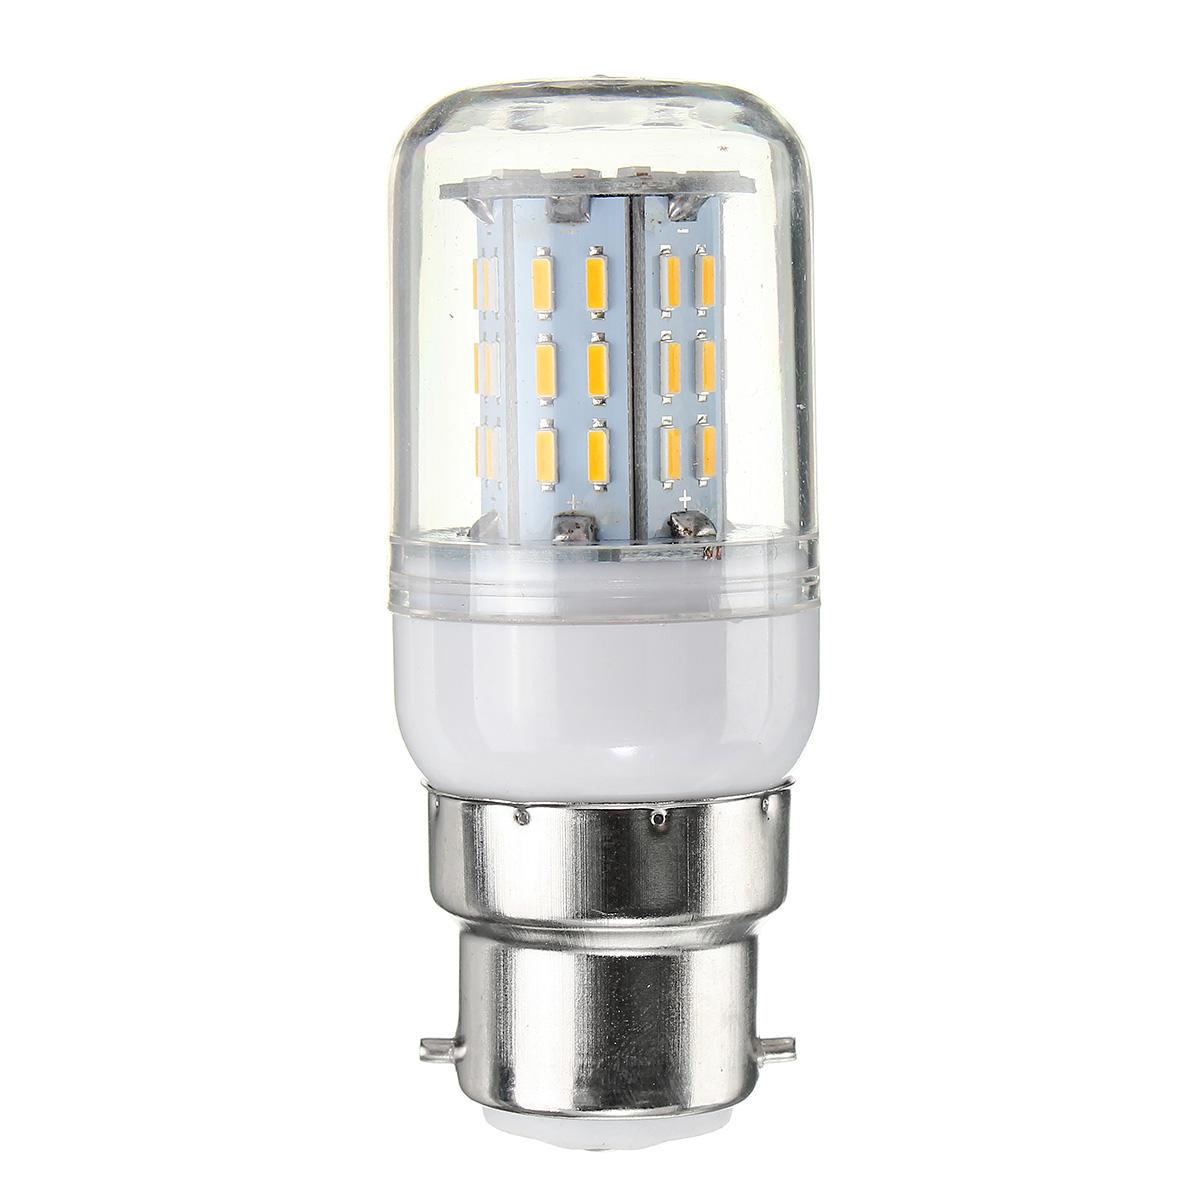 Dimmable E27 E14 E12 G9 GU10 B22 6W SMD4014 LED Corn Bulb Chandelier Light AC220V - 6